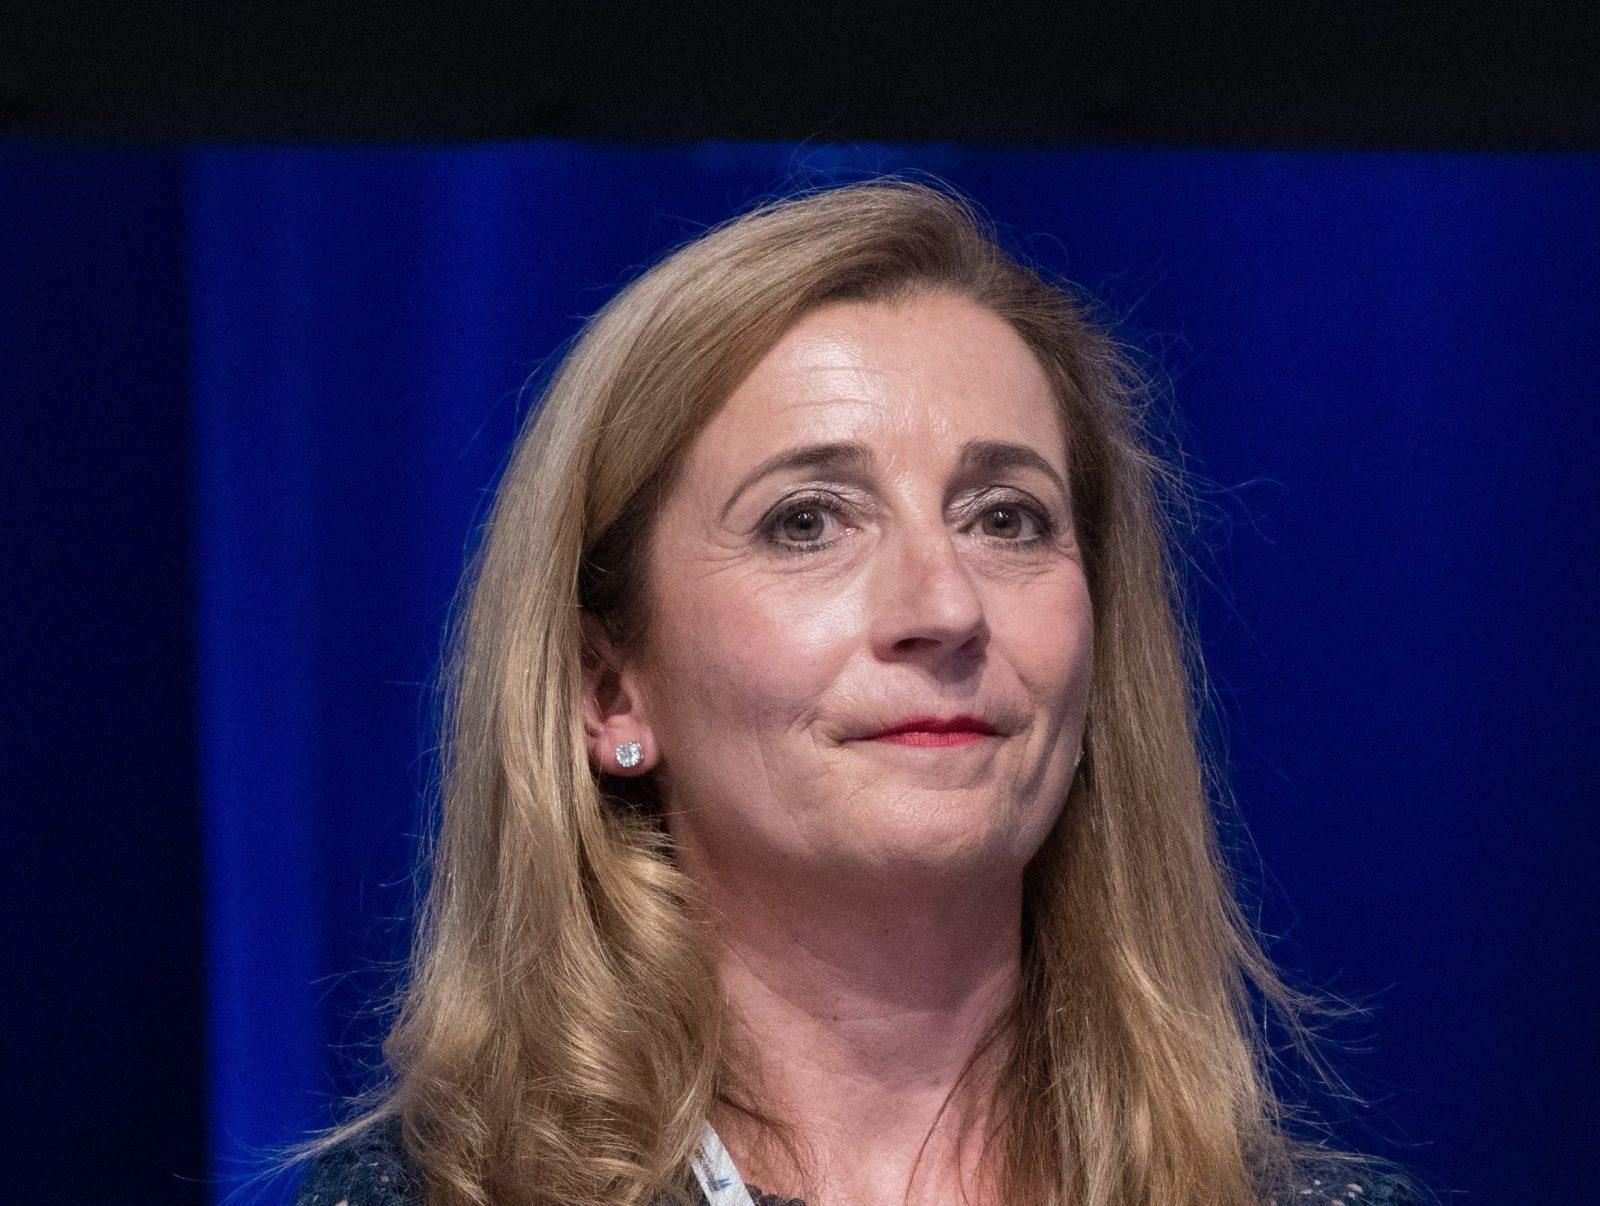 Astrid Hamker